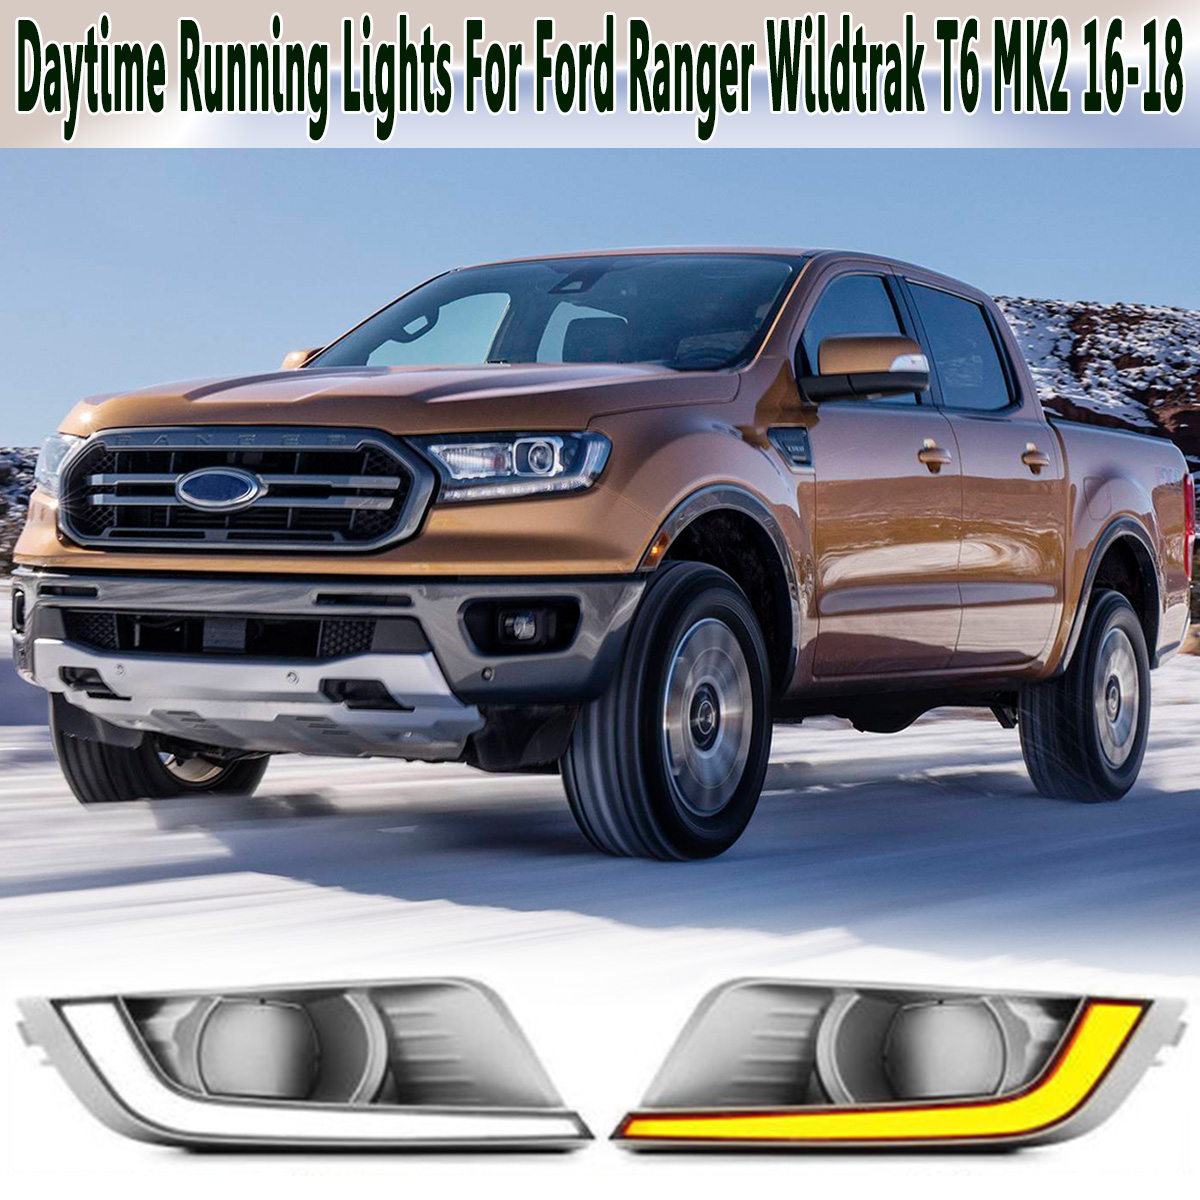 2pcs COB LED DRL Daytime Running Car Lights Assembly Lamp for Ford Ranger T6 MK2 2016-2018 XL XLT K sesibibi 2pcs цвет случайный xl